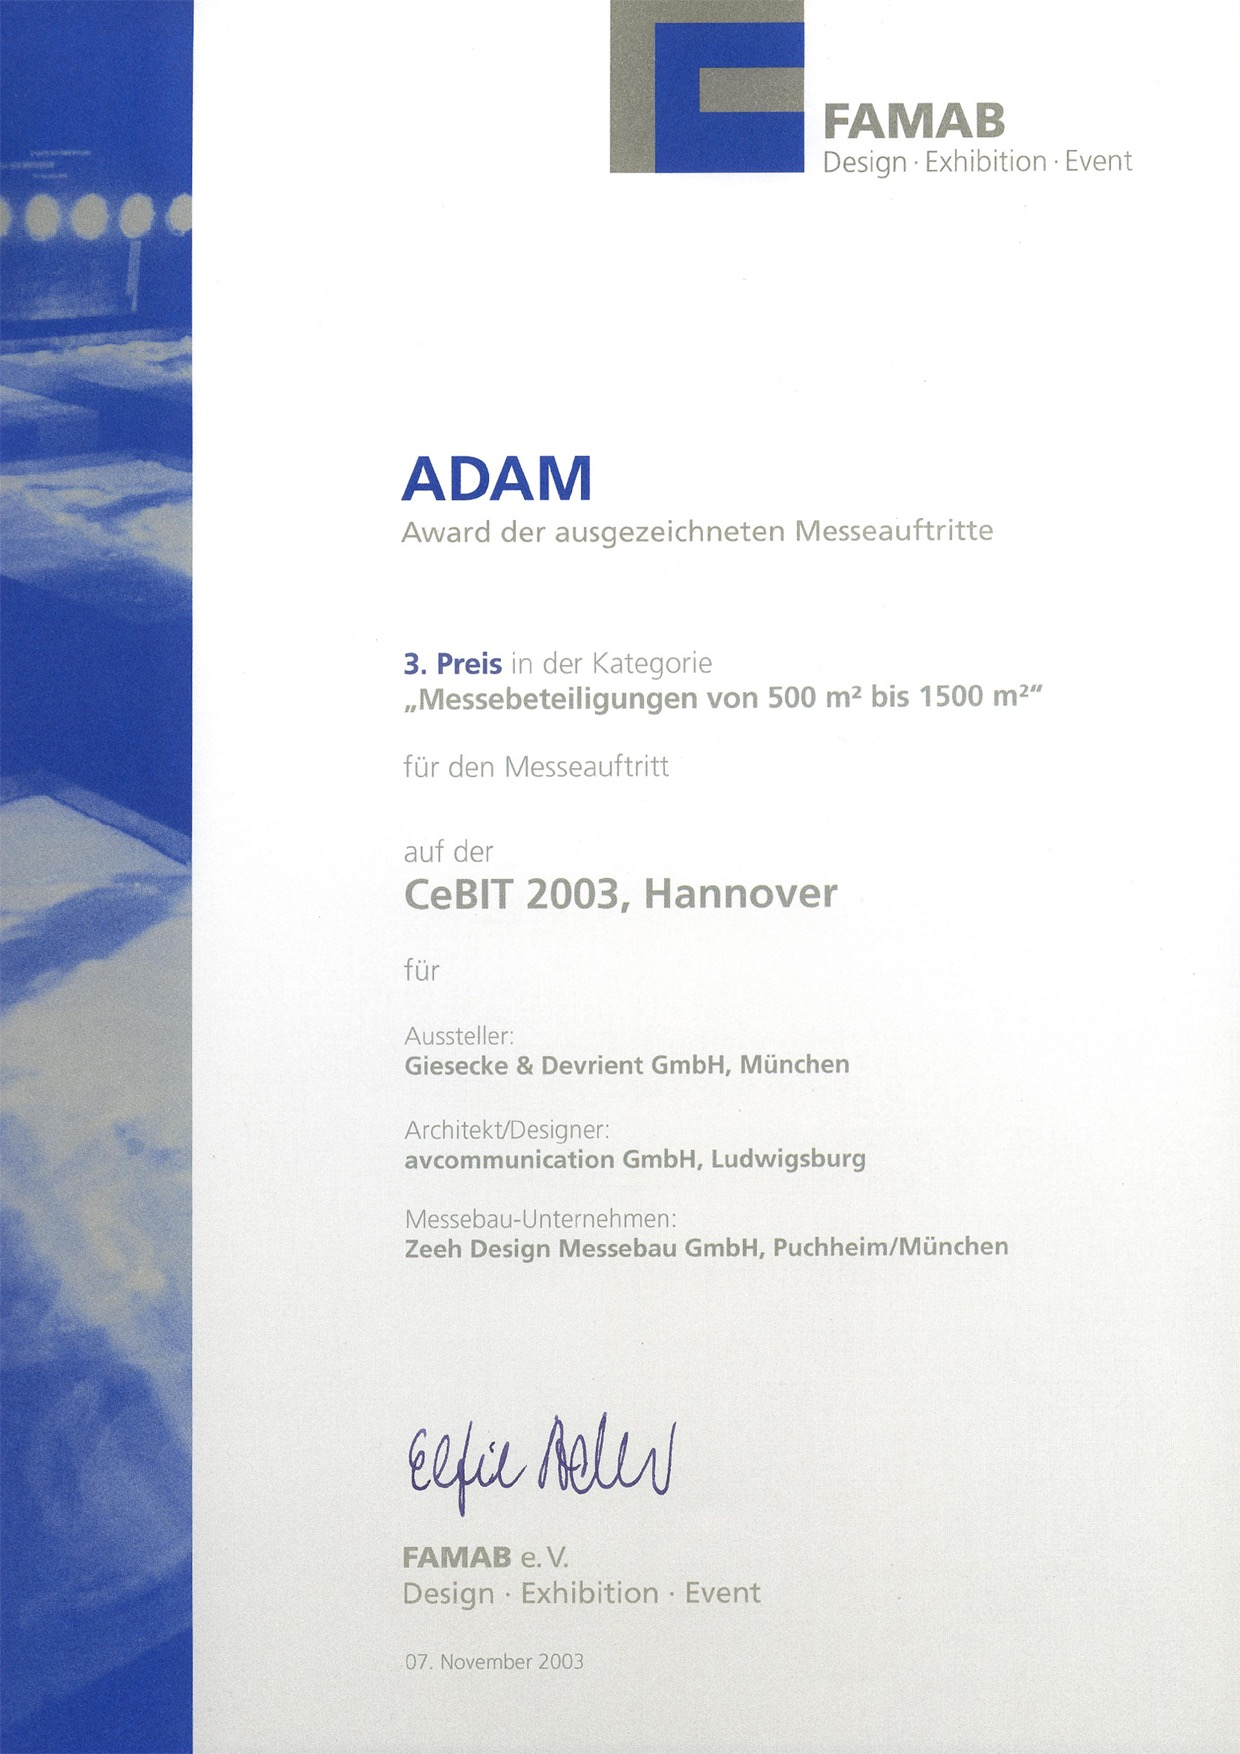 ADAM_award_2003.jpg